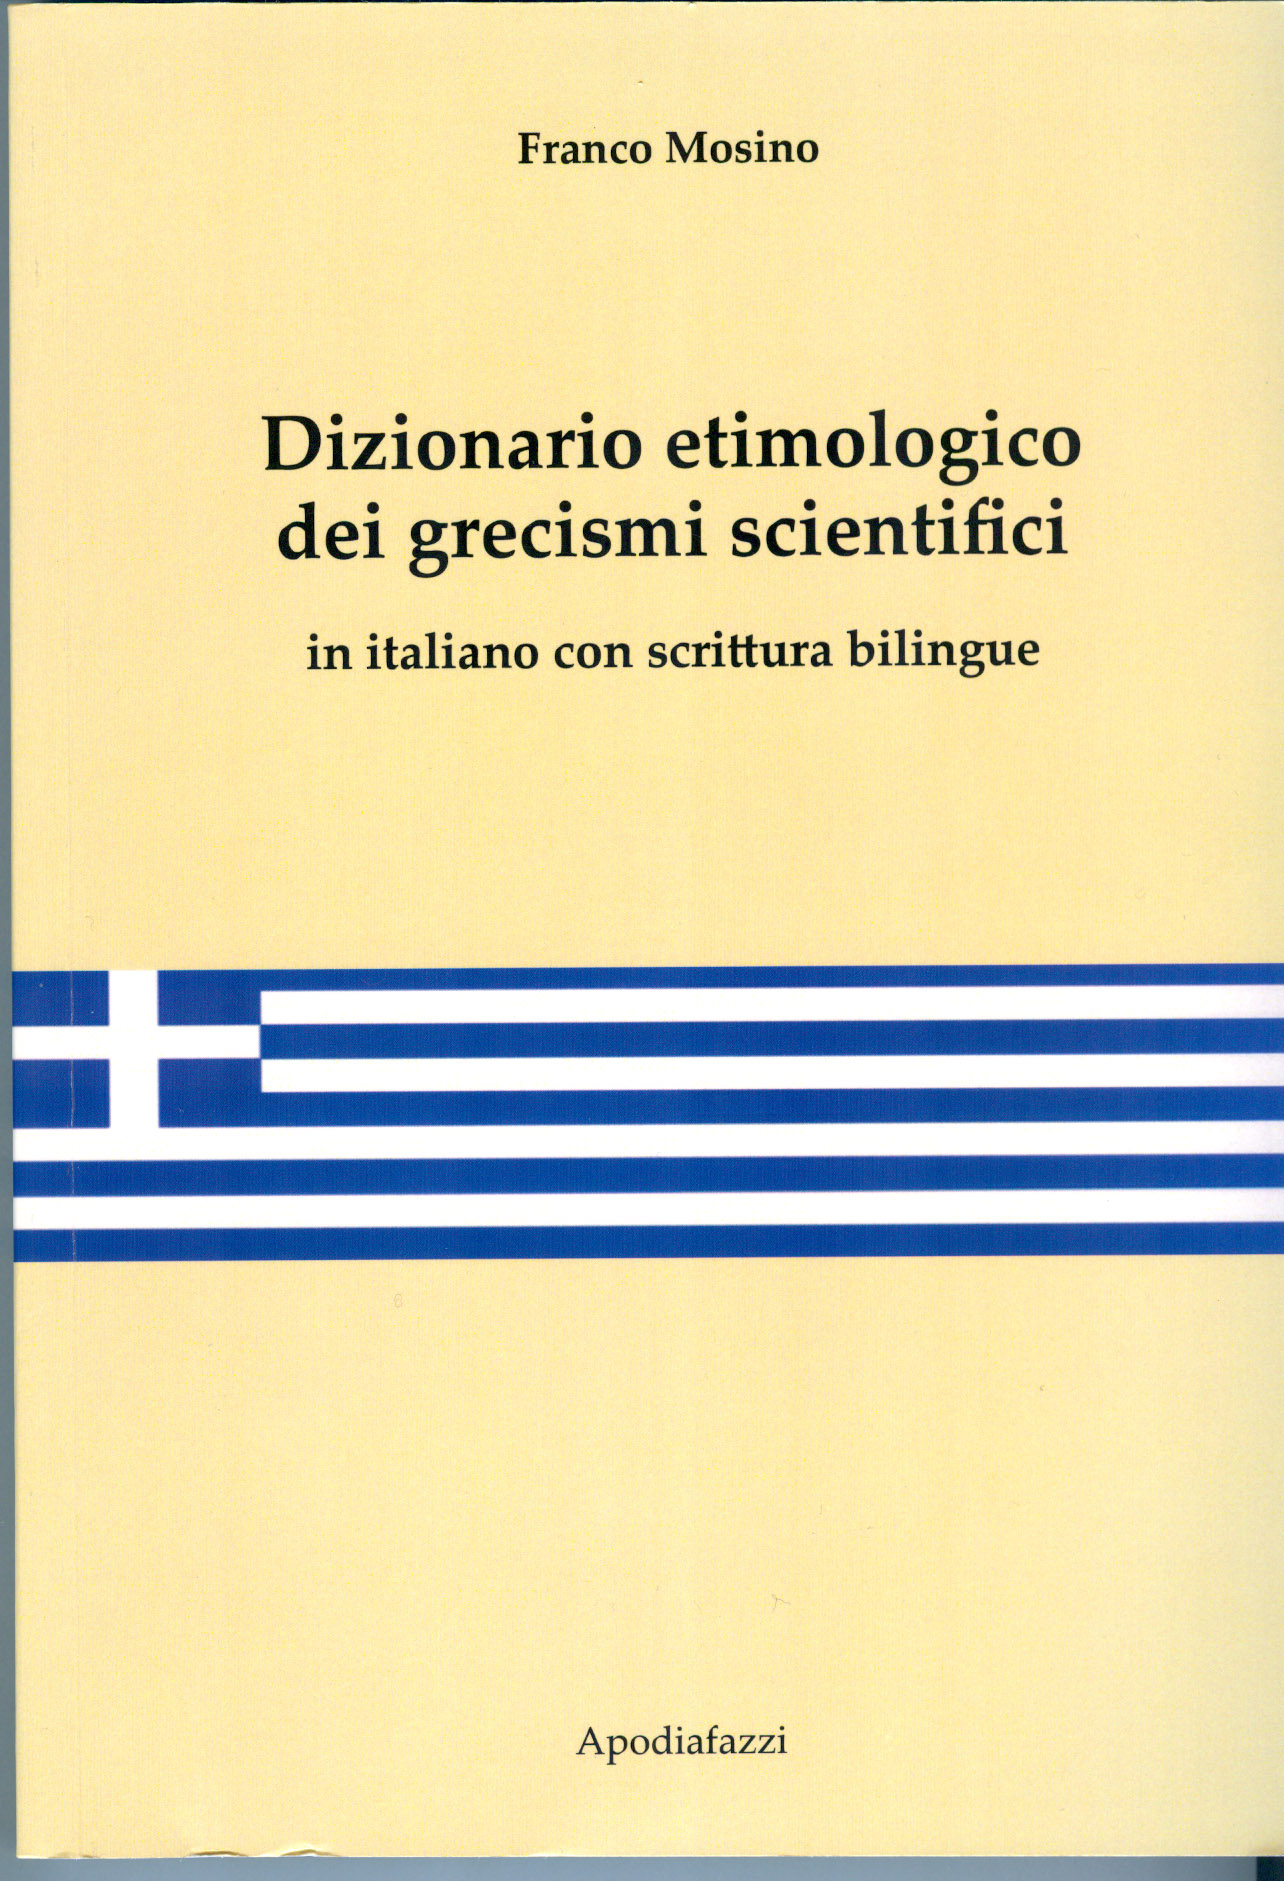 Mosino grecismi201